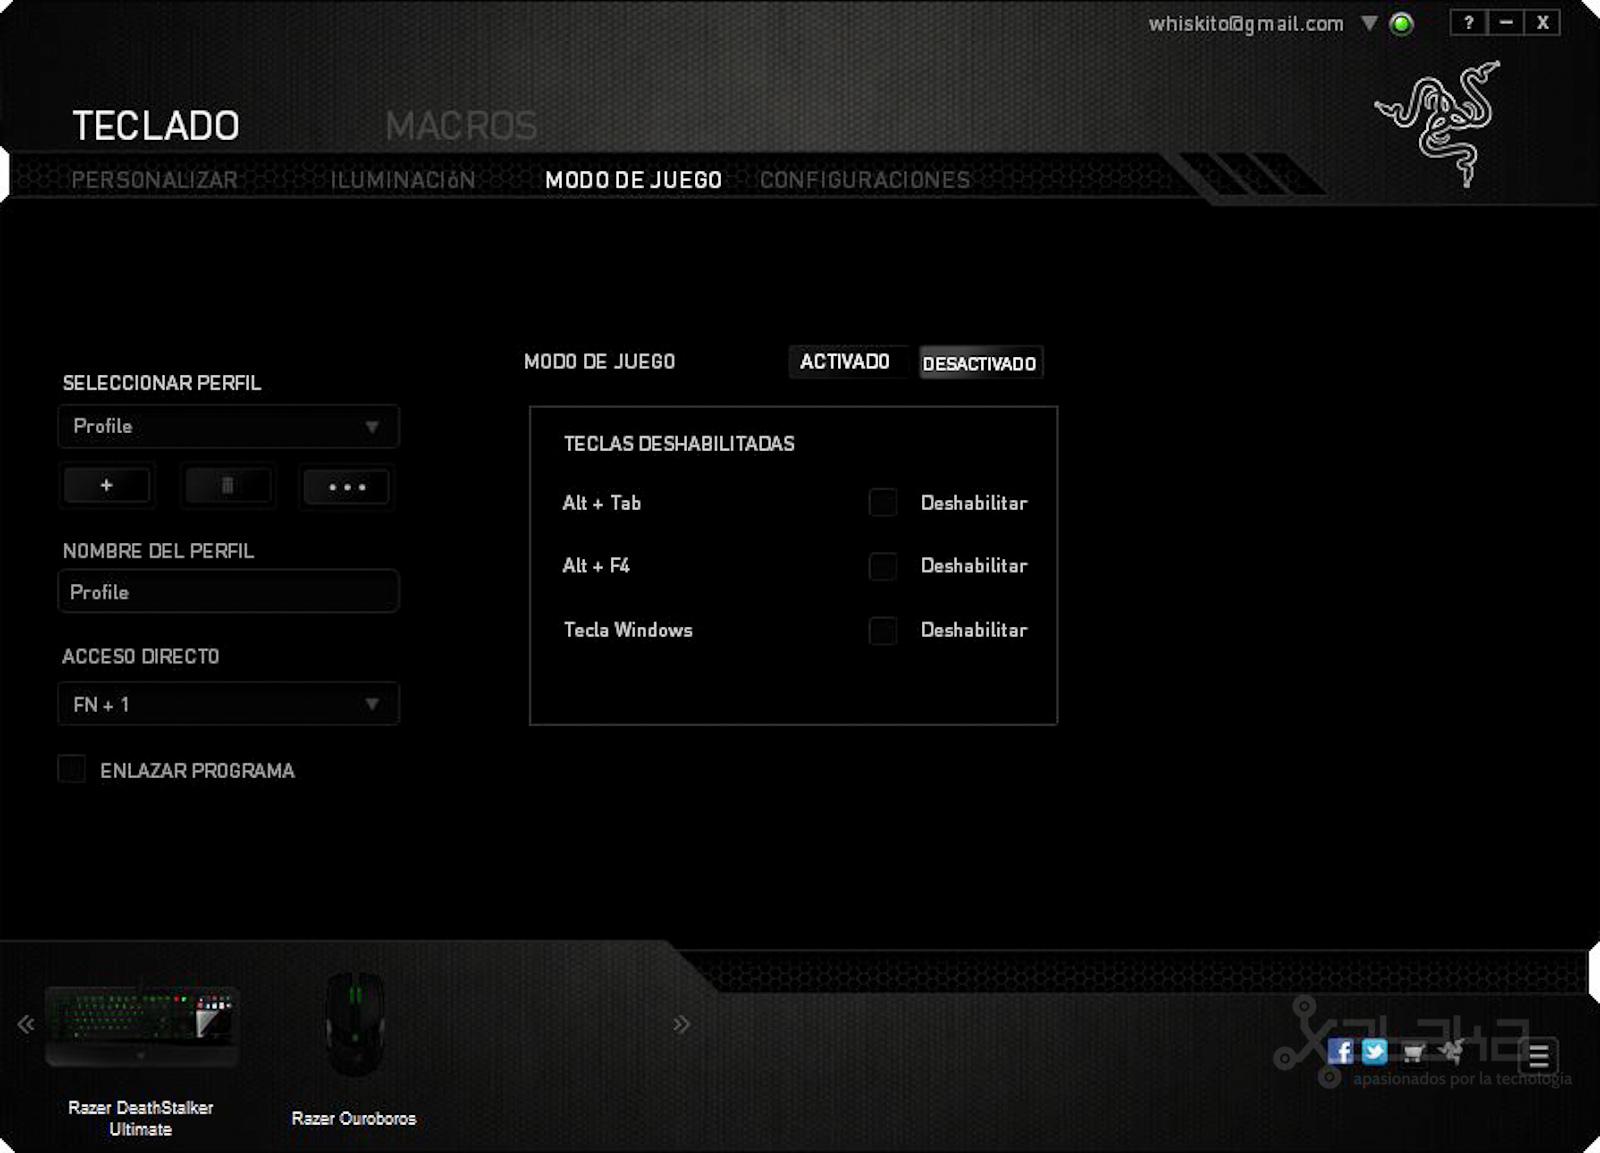 Razer Synapse 2.0 en el DeathStalker Ultimate